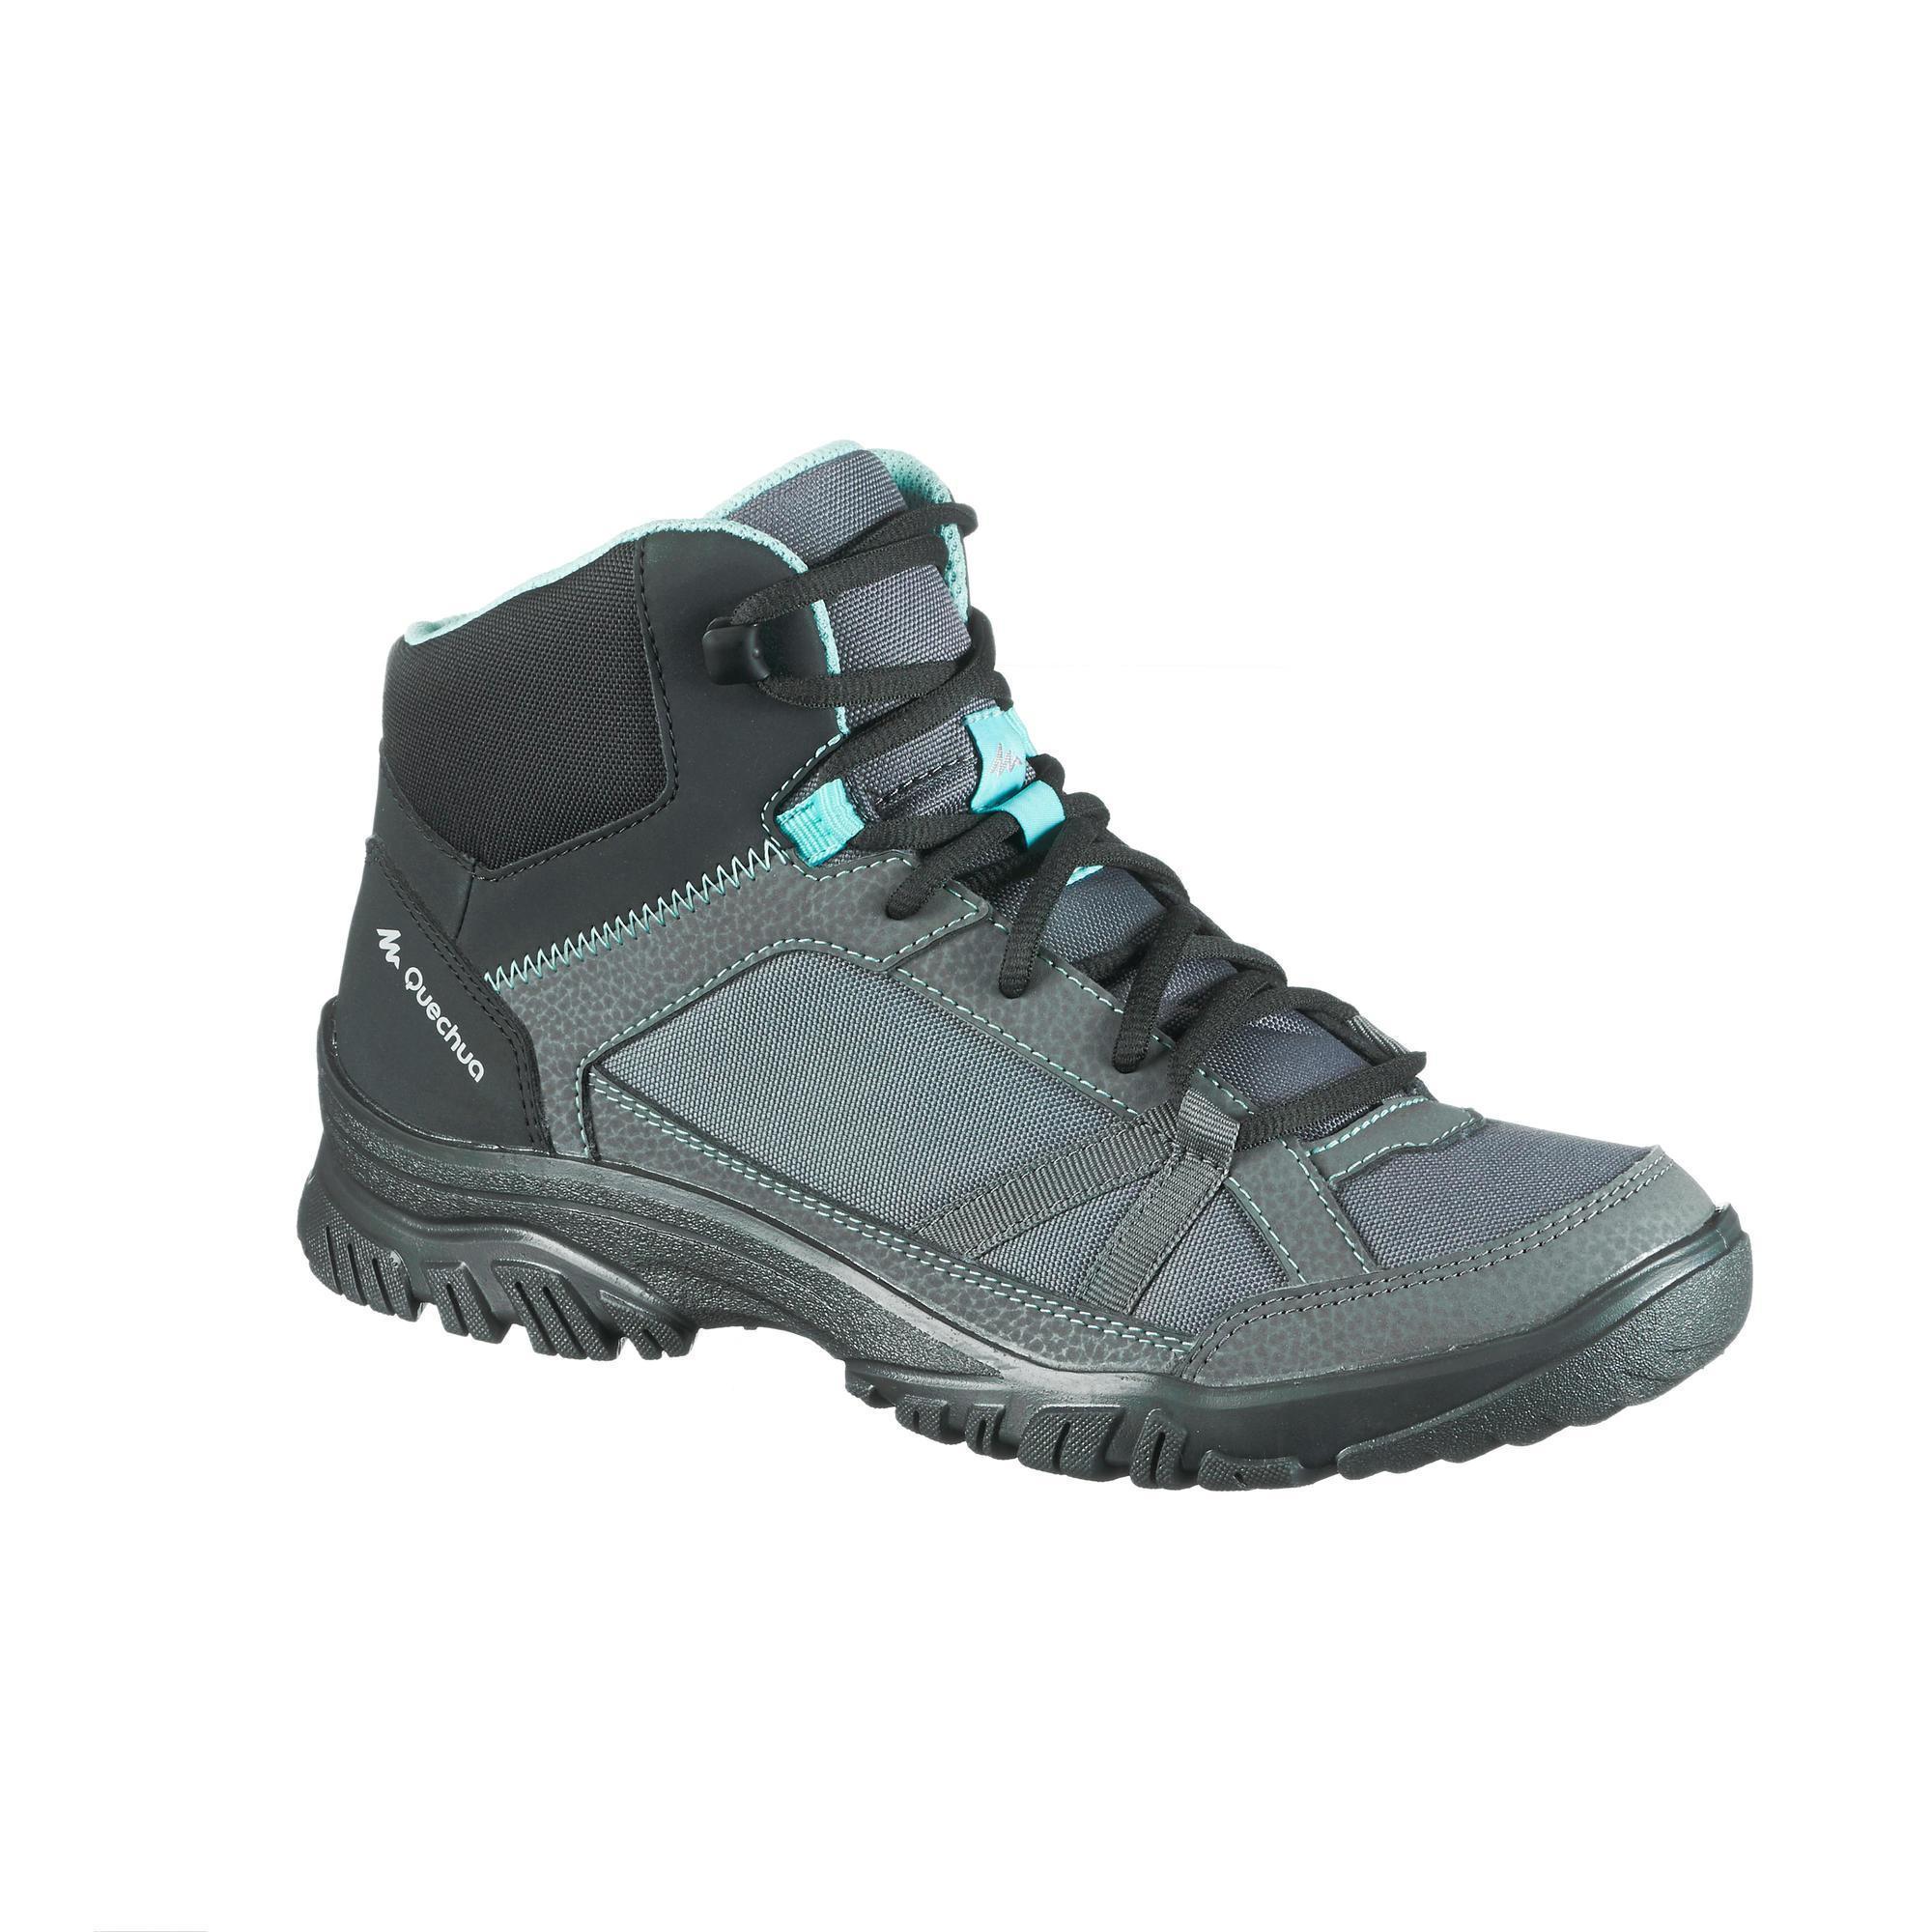 free delivery new appearance look for Chaussures de randonnée nature NH100 mid gris bleu femme